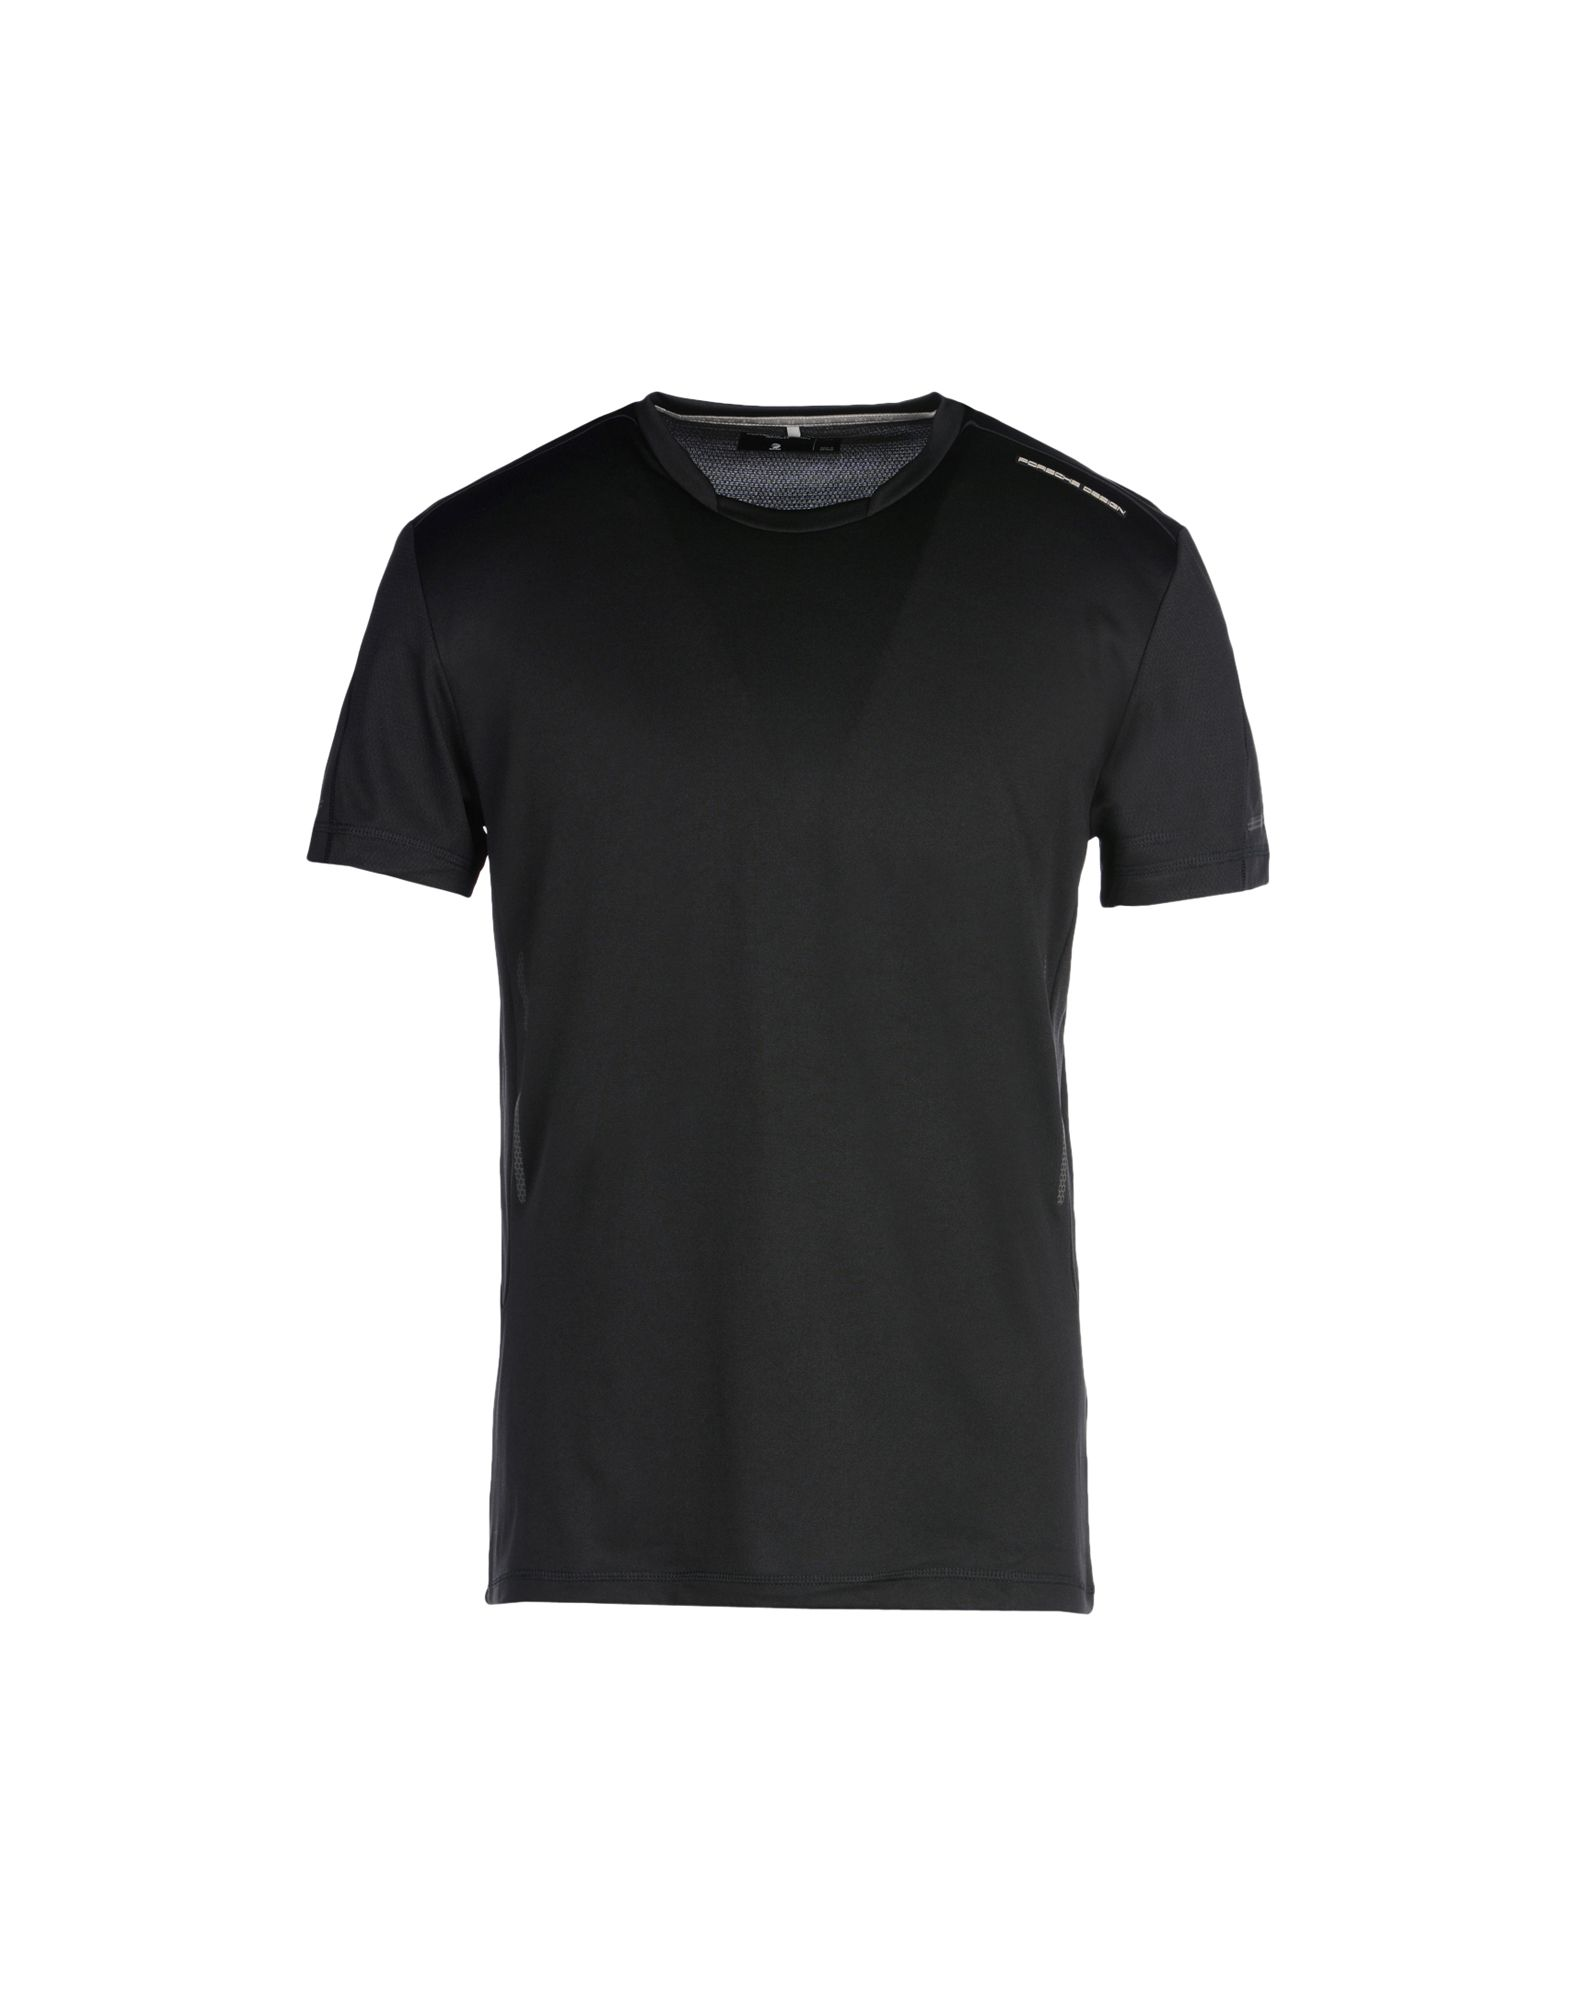 PORSCHE DESIGN SPORT by ADIDAS T - shirts